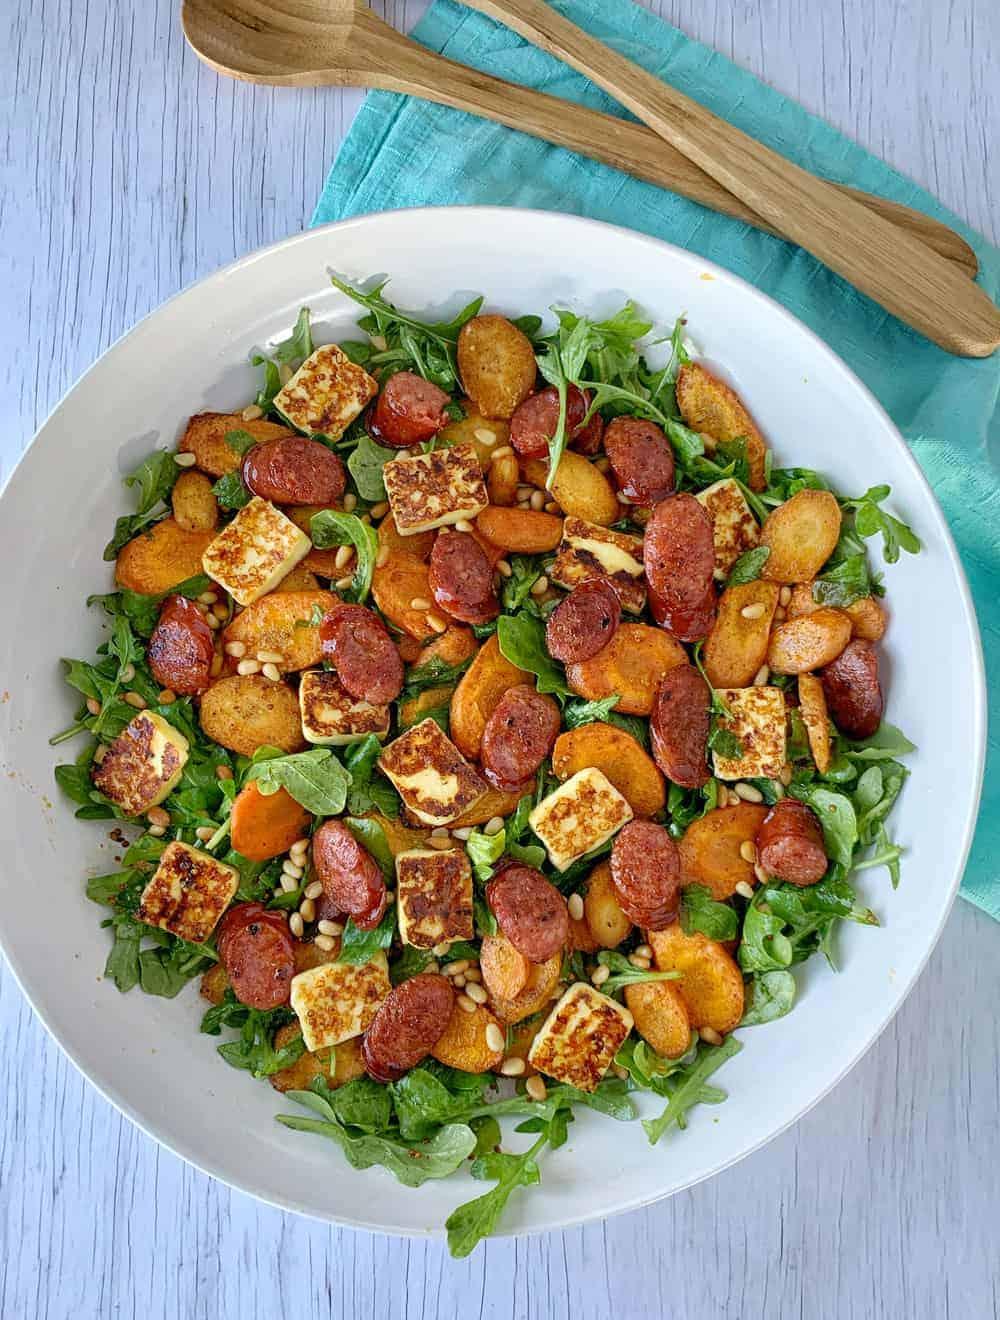 Carrot and chorizo salad